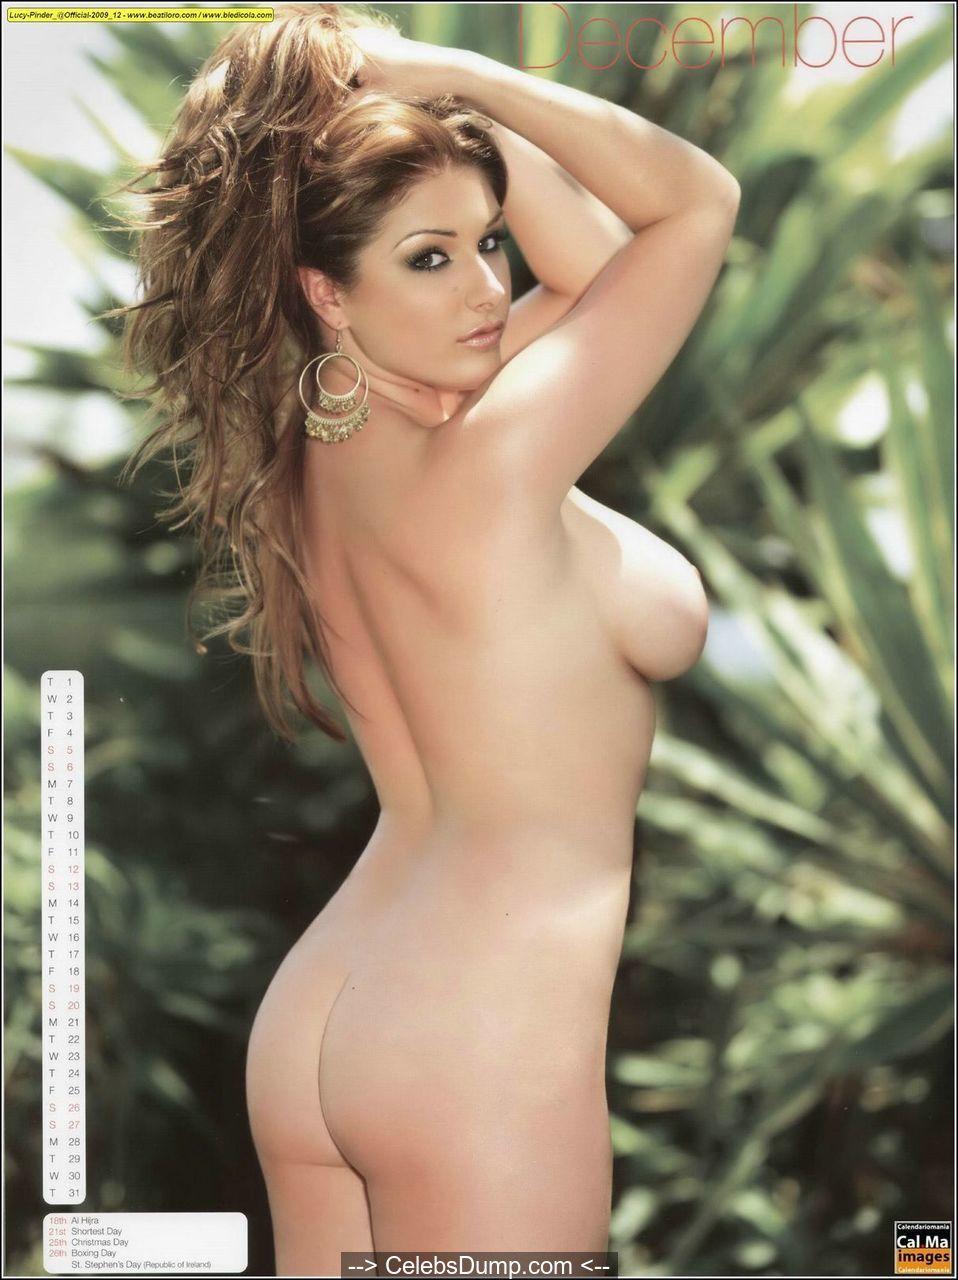 Annina hellenthal nude